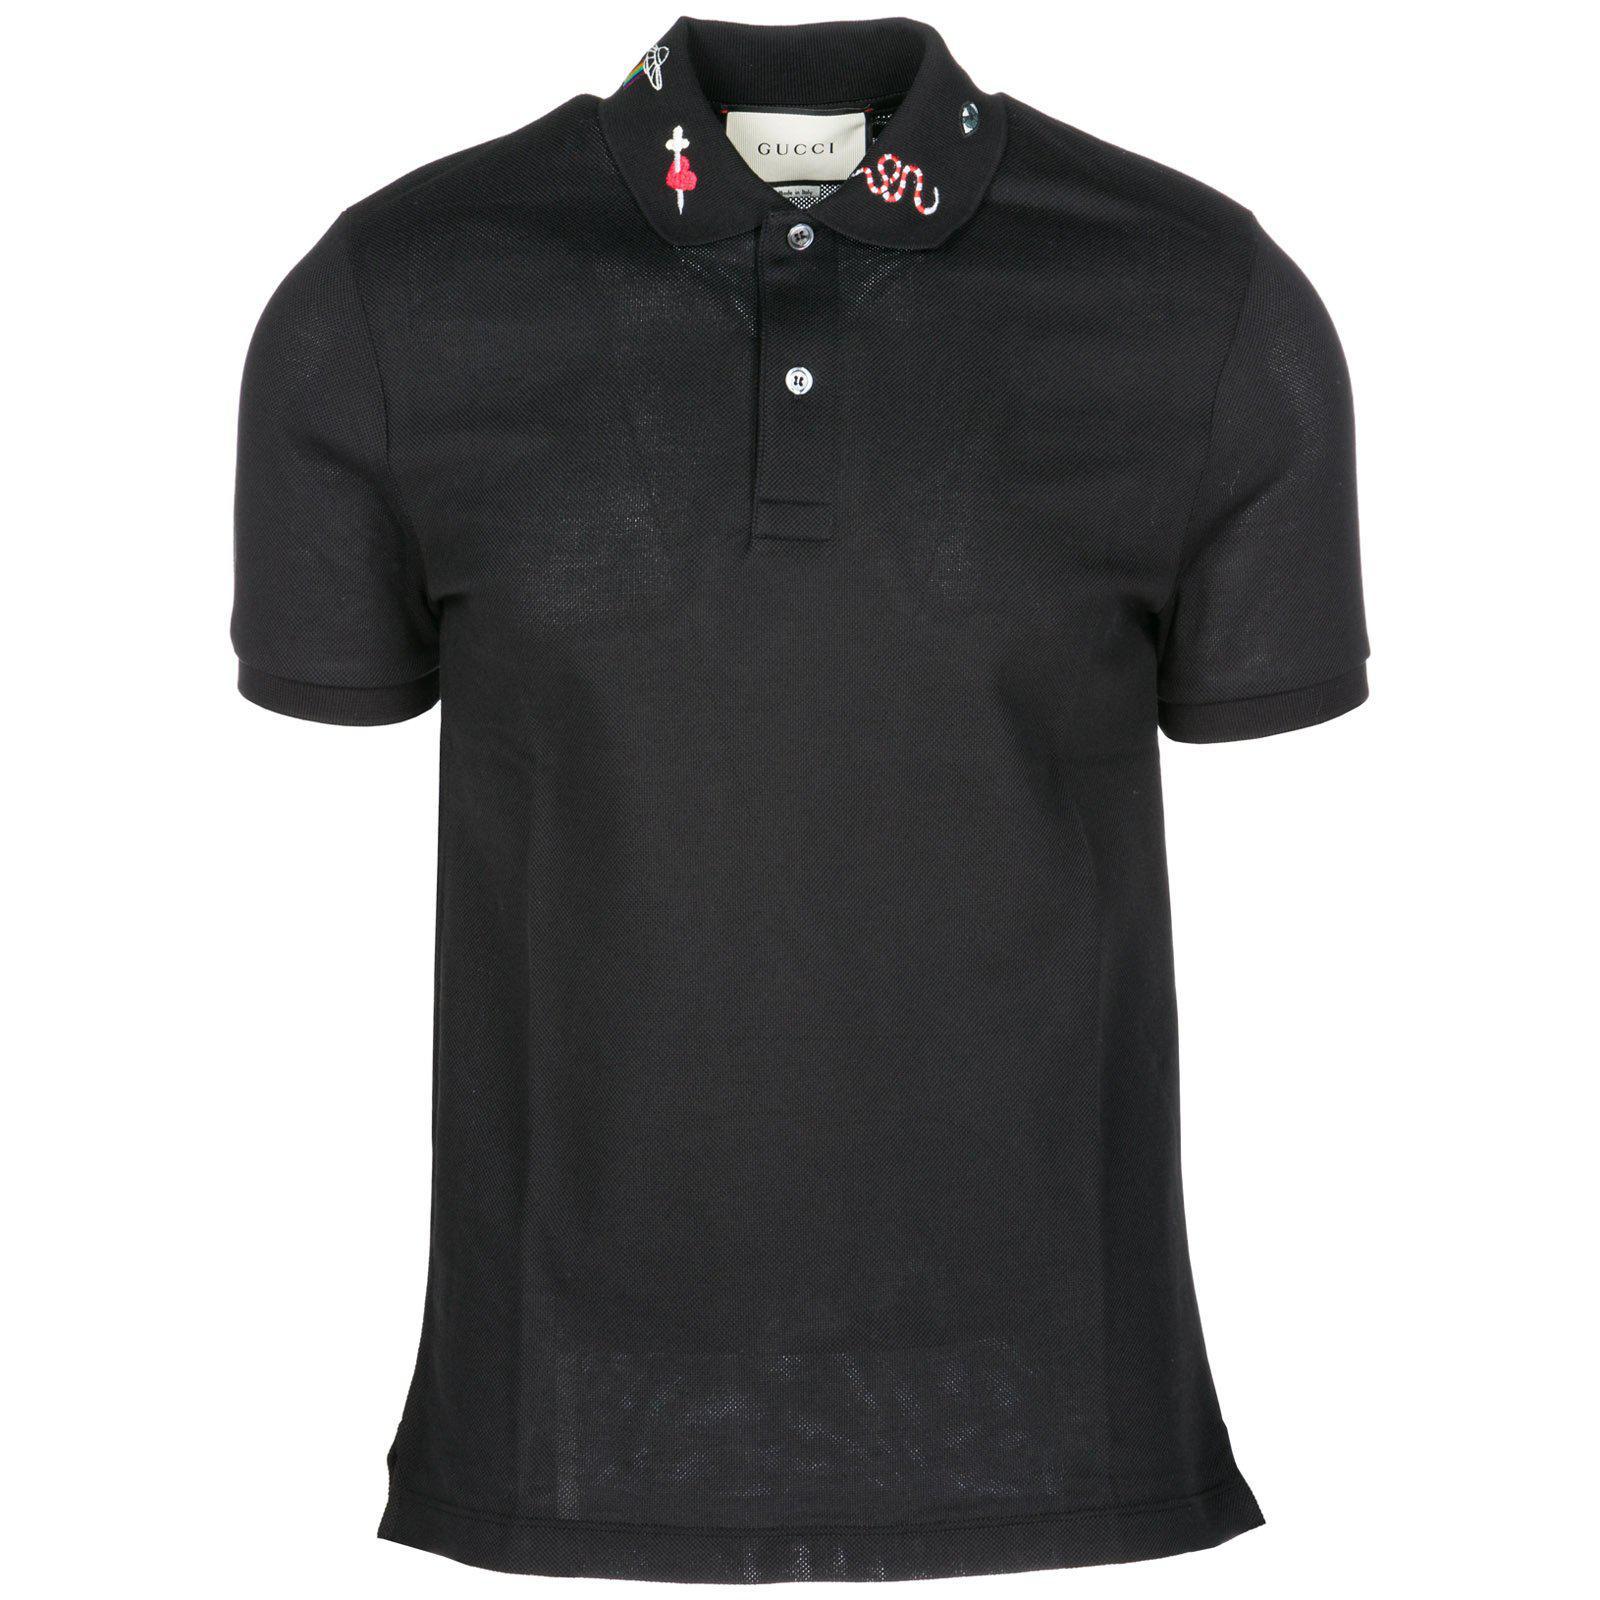 550646871fb0 Gucci Men's Emblems Embroidered-Collar Polo Shirt, Black/Gold | ModeSens